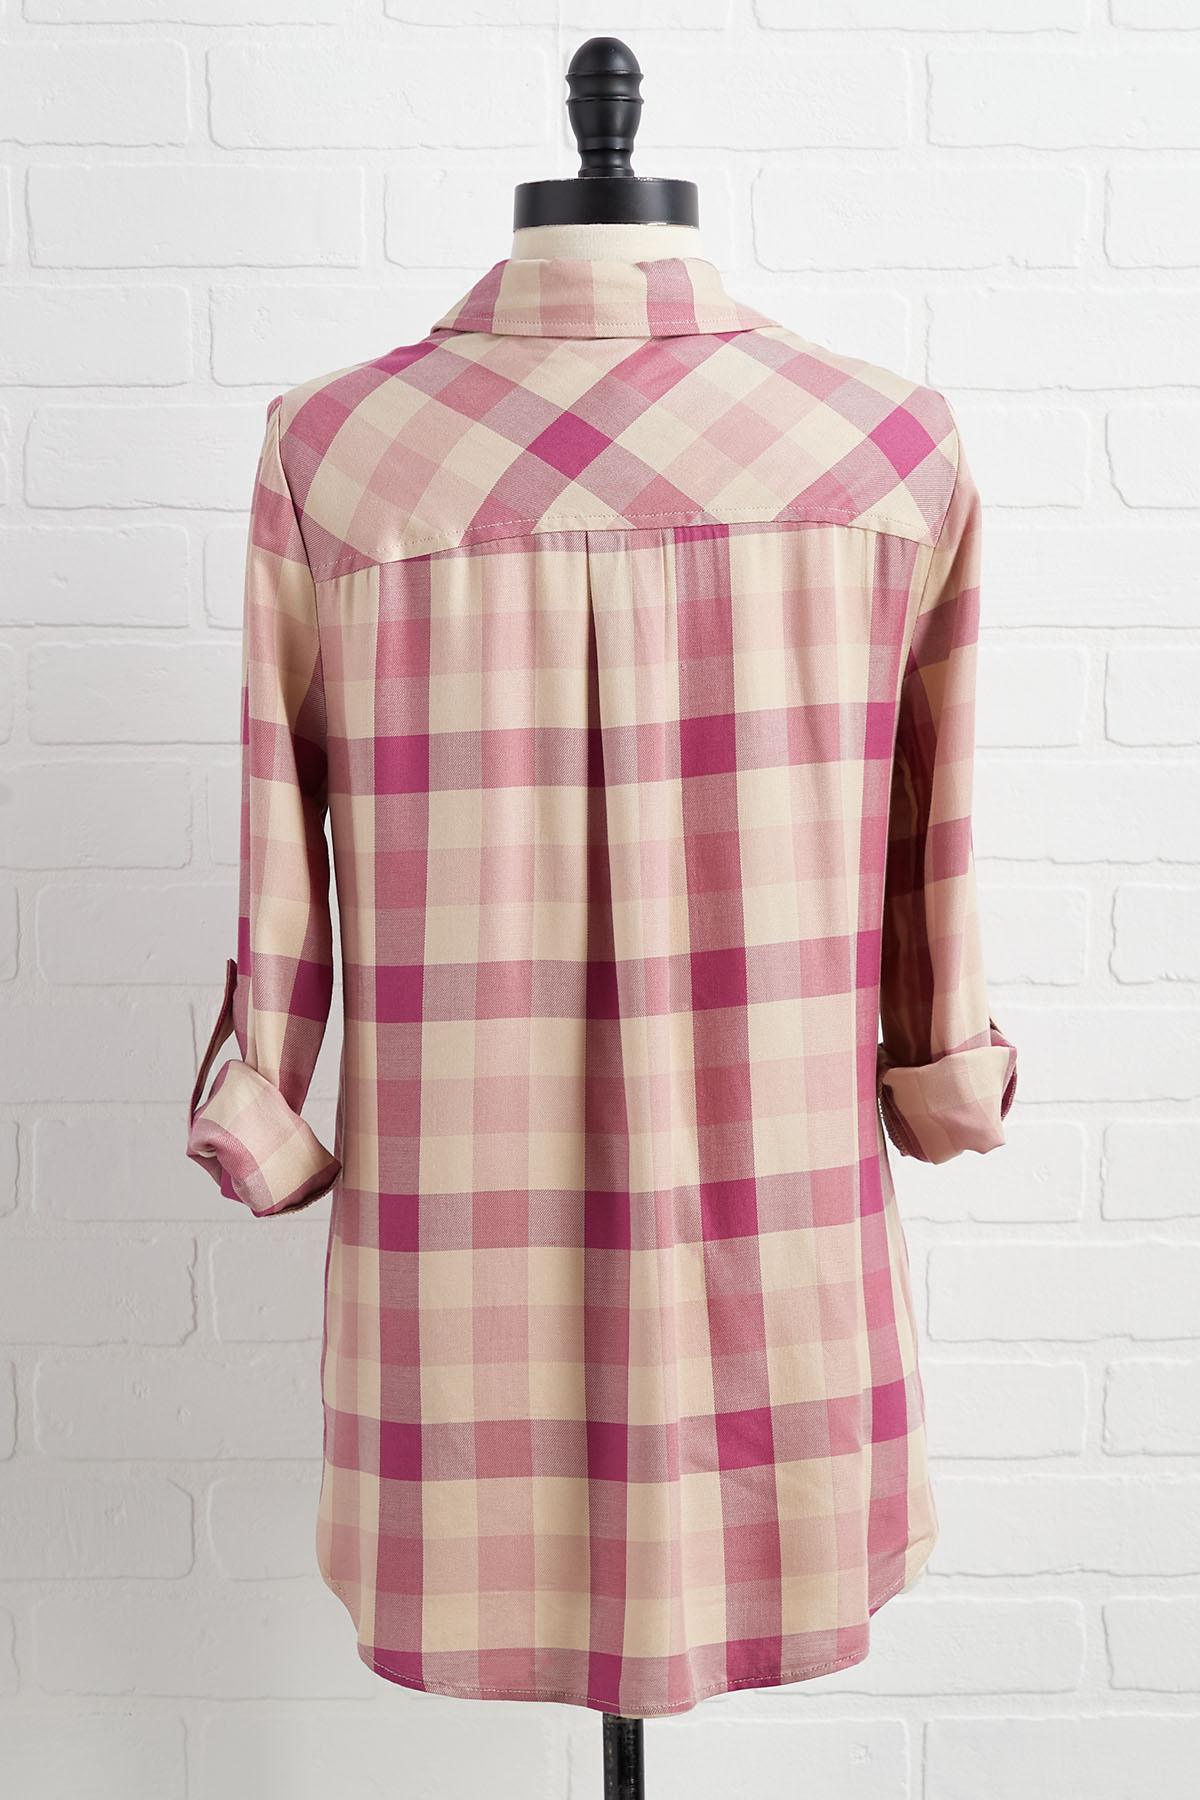 Made You Blush Plaid Shirt